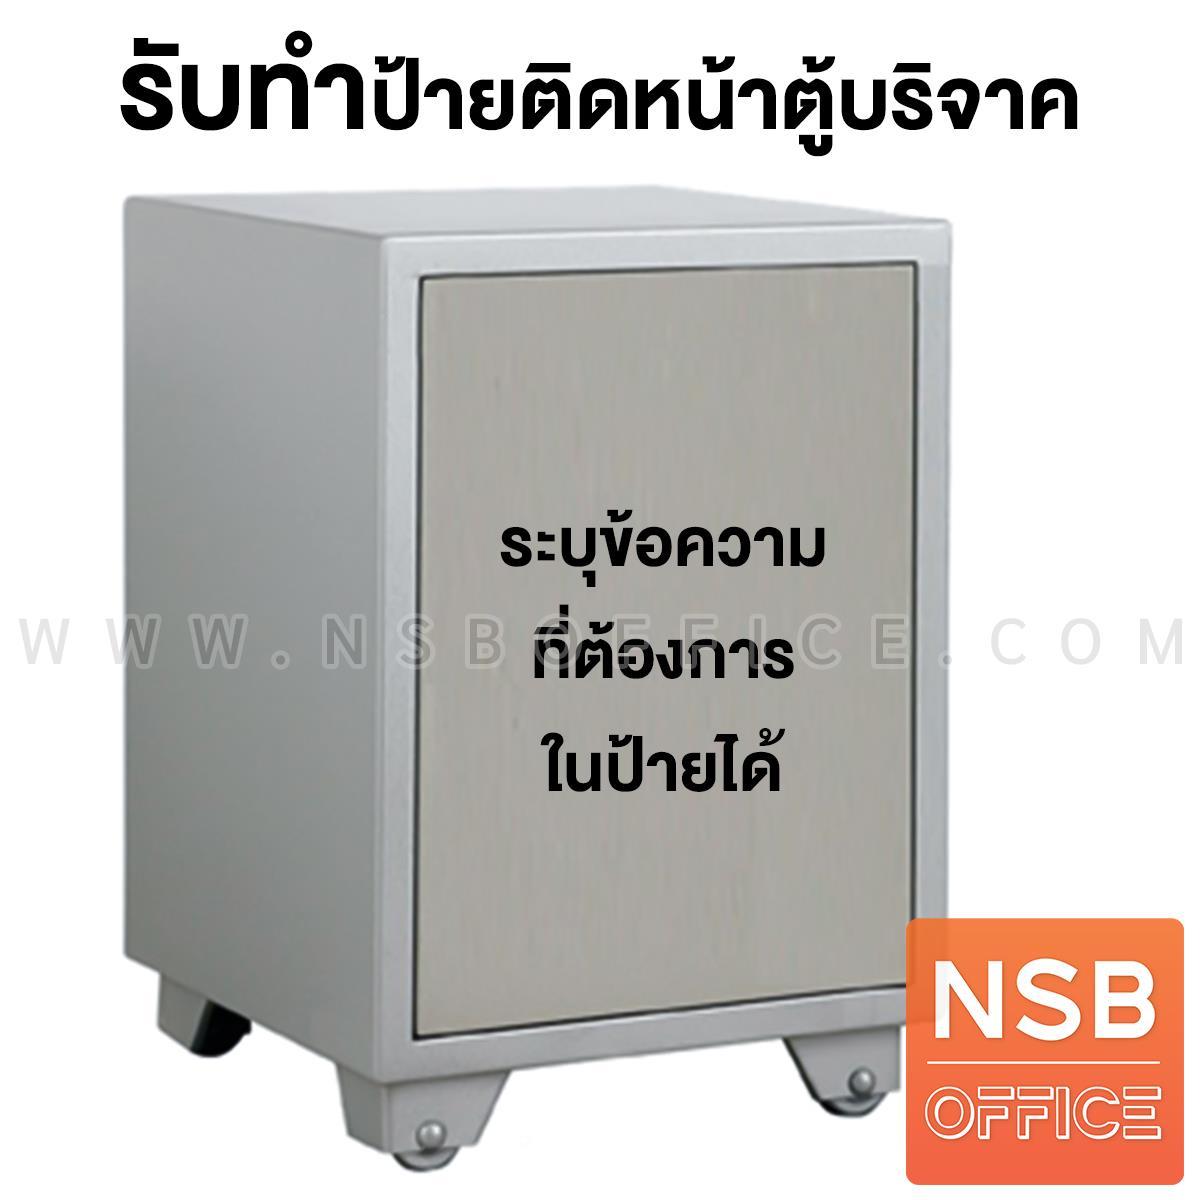 F01A074:ตู้เซฟเจาะช่องบริจาค รุ่น TS670  รับทำป้ายติดหน้าตู้บริจาค ระบุข้อความได้